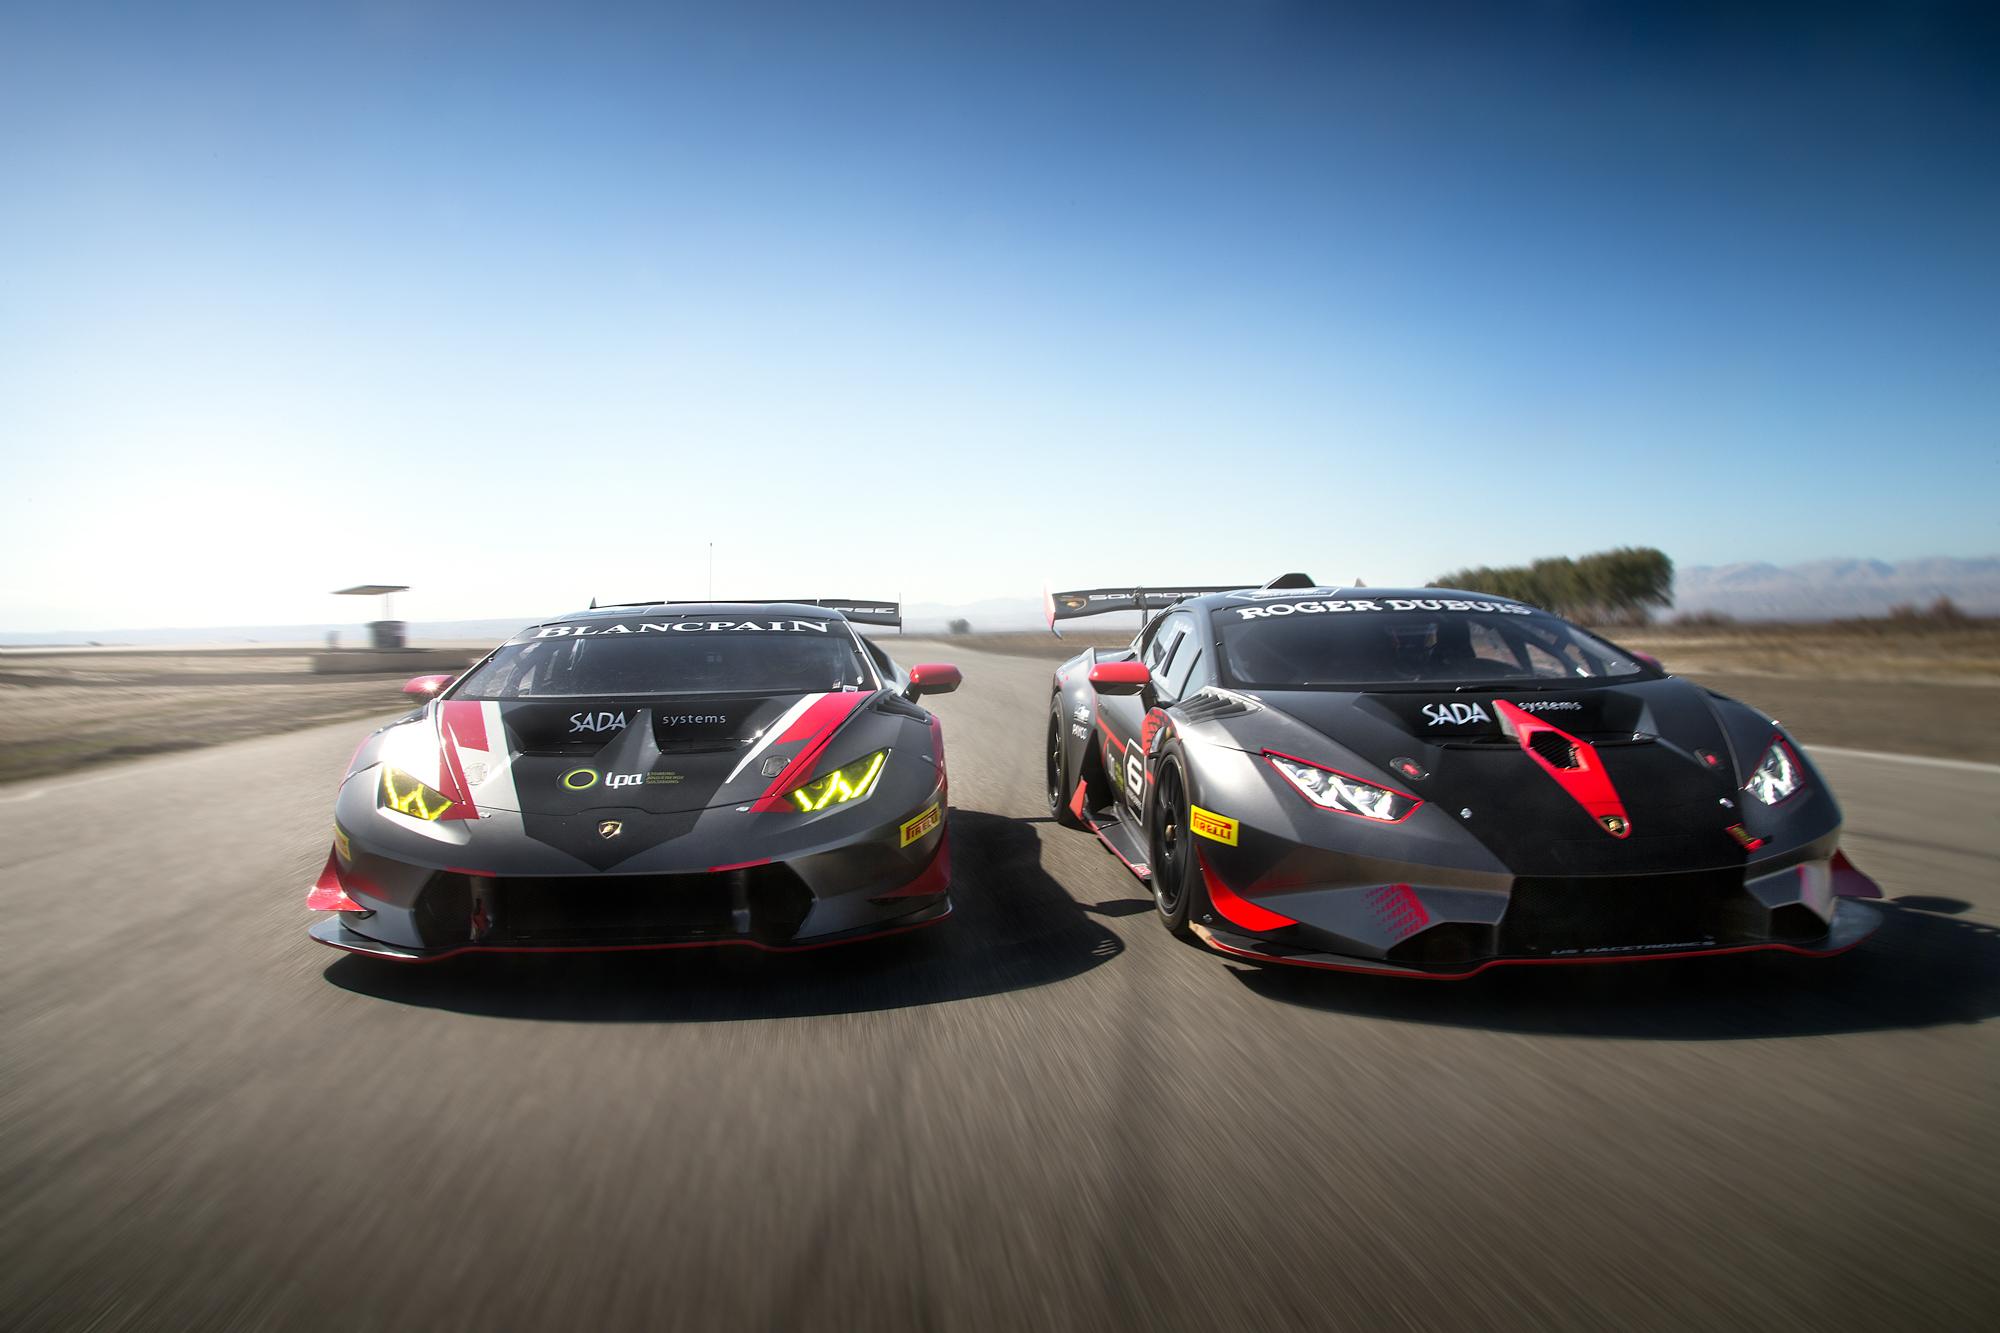 Steven-Racing-20180221-72969.jpg